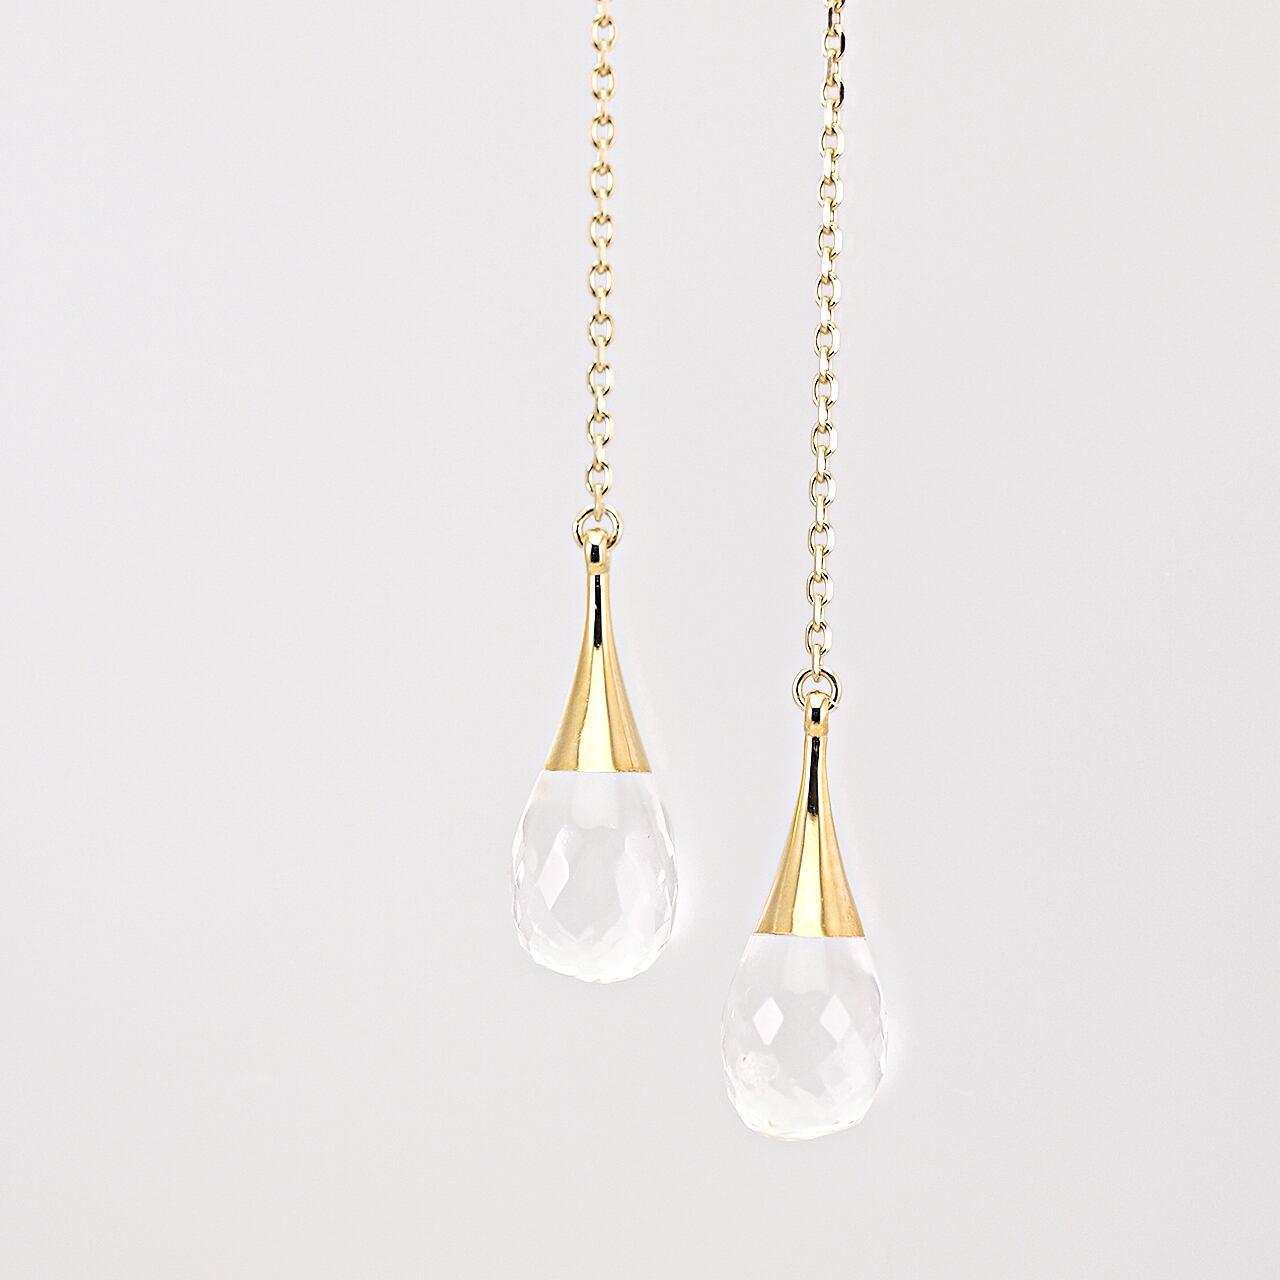 Drop american earrings / Quartz